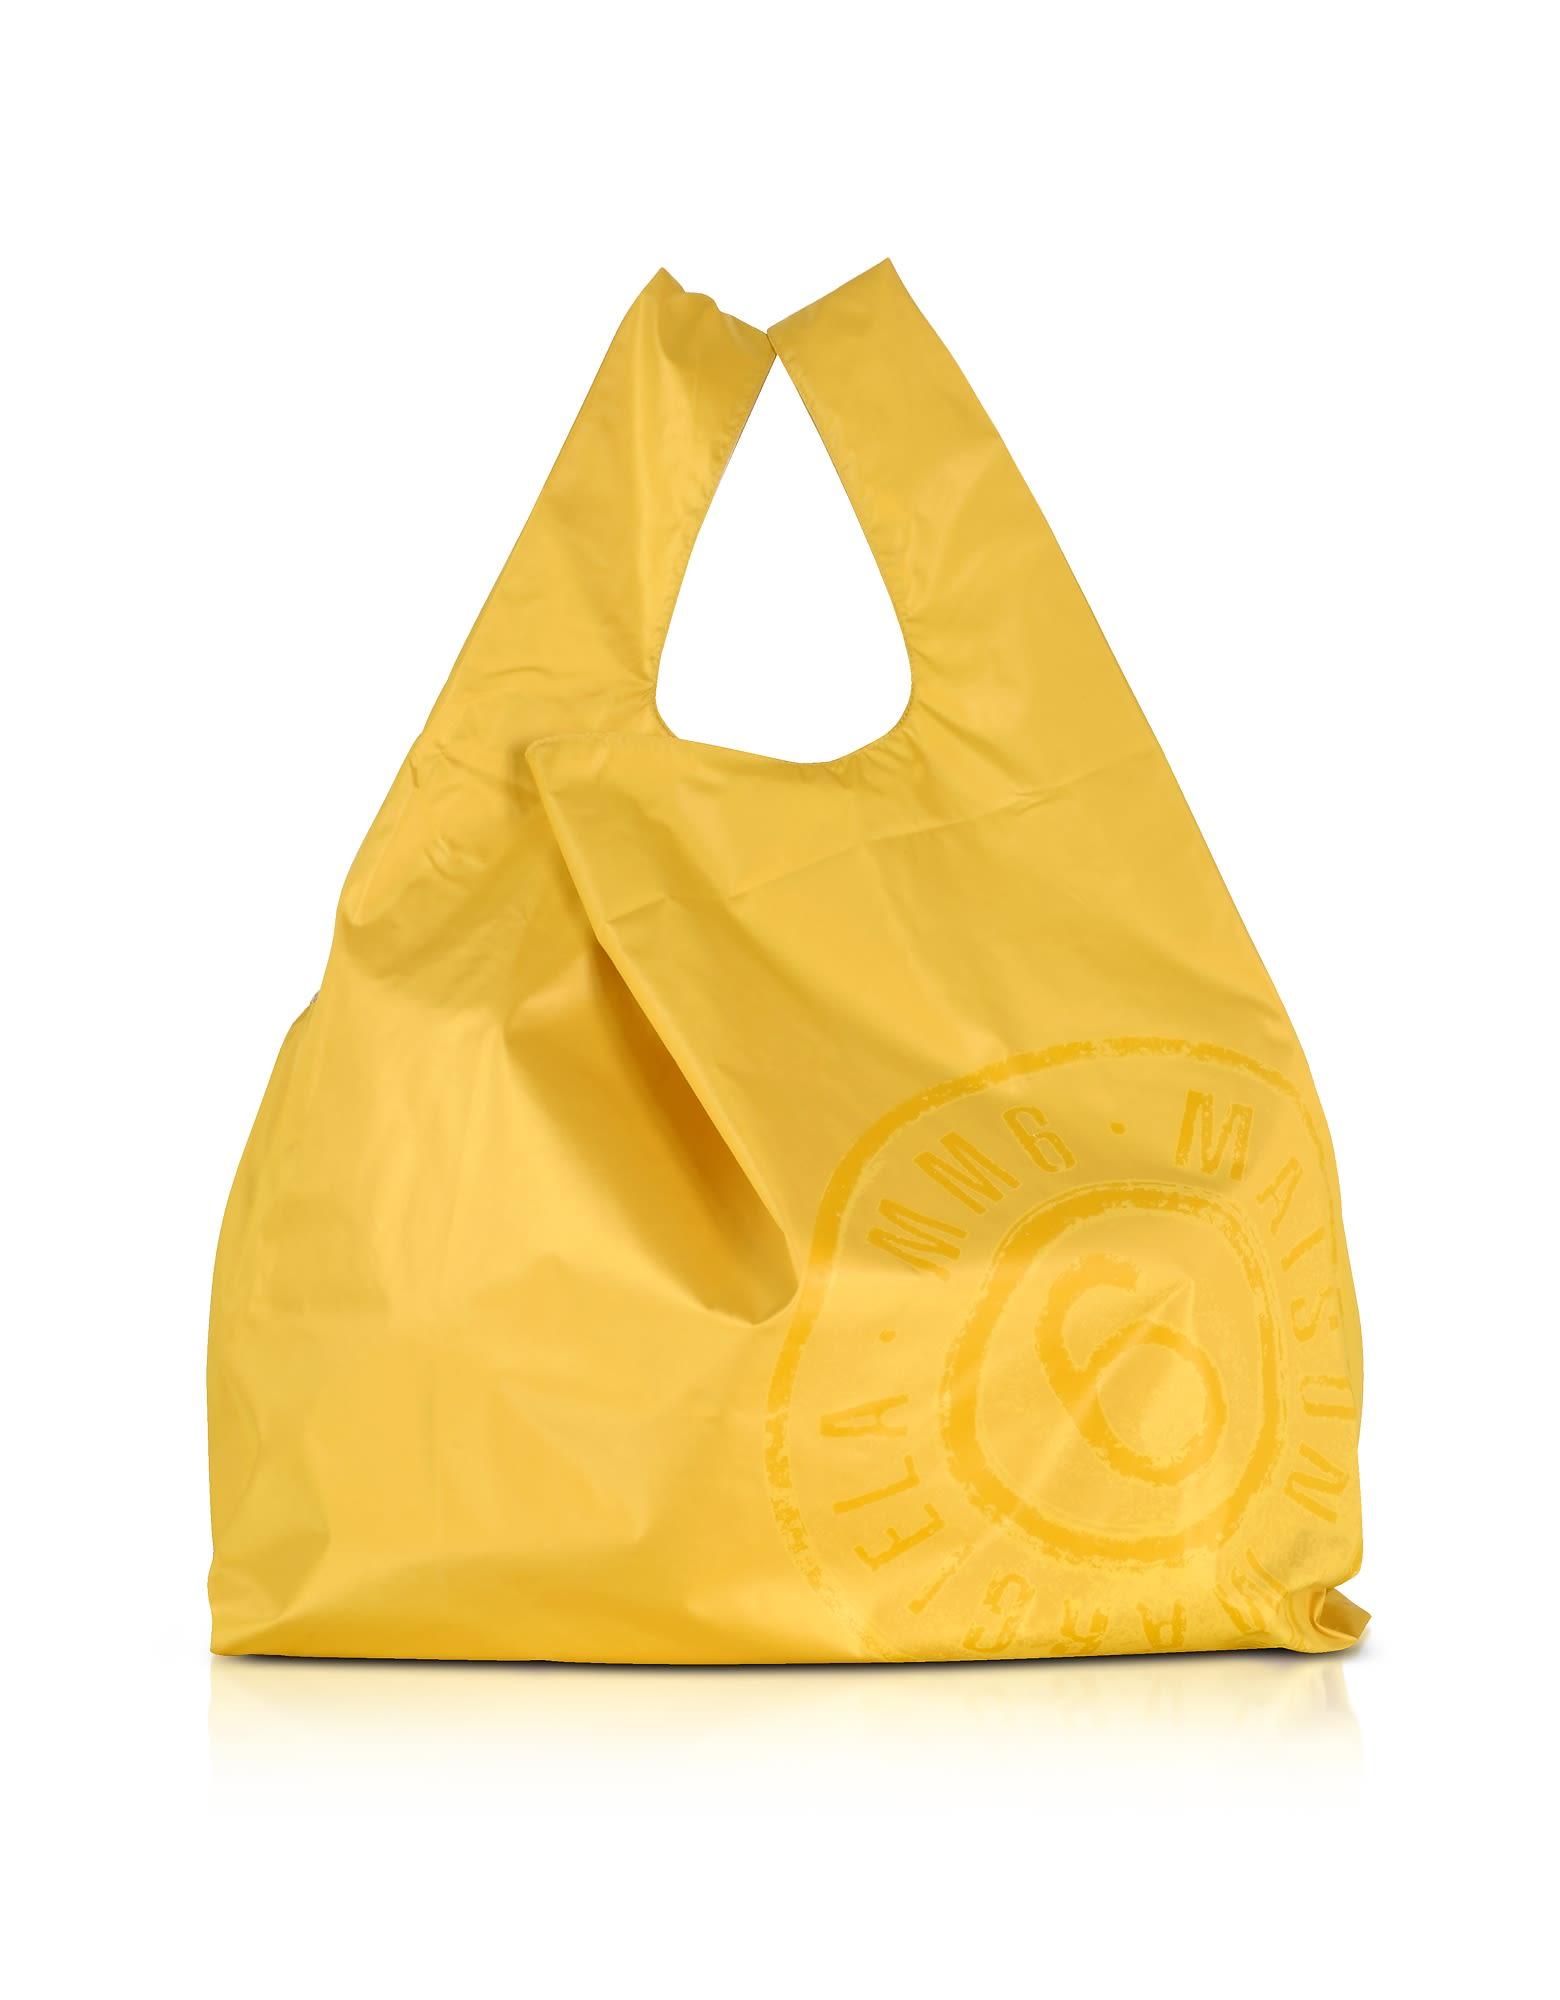 mm6 maison margiela - Mm6 Maison Martin Margiela Yellow & White Double Face Nylon Market Bag W/logo